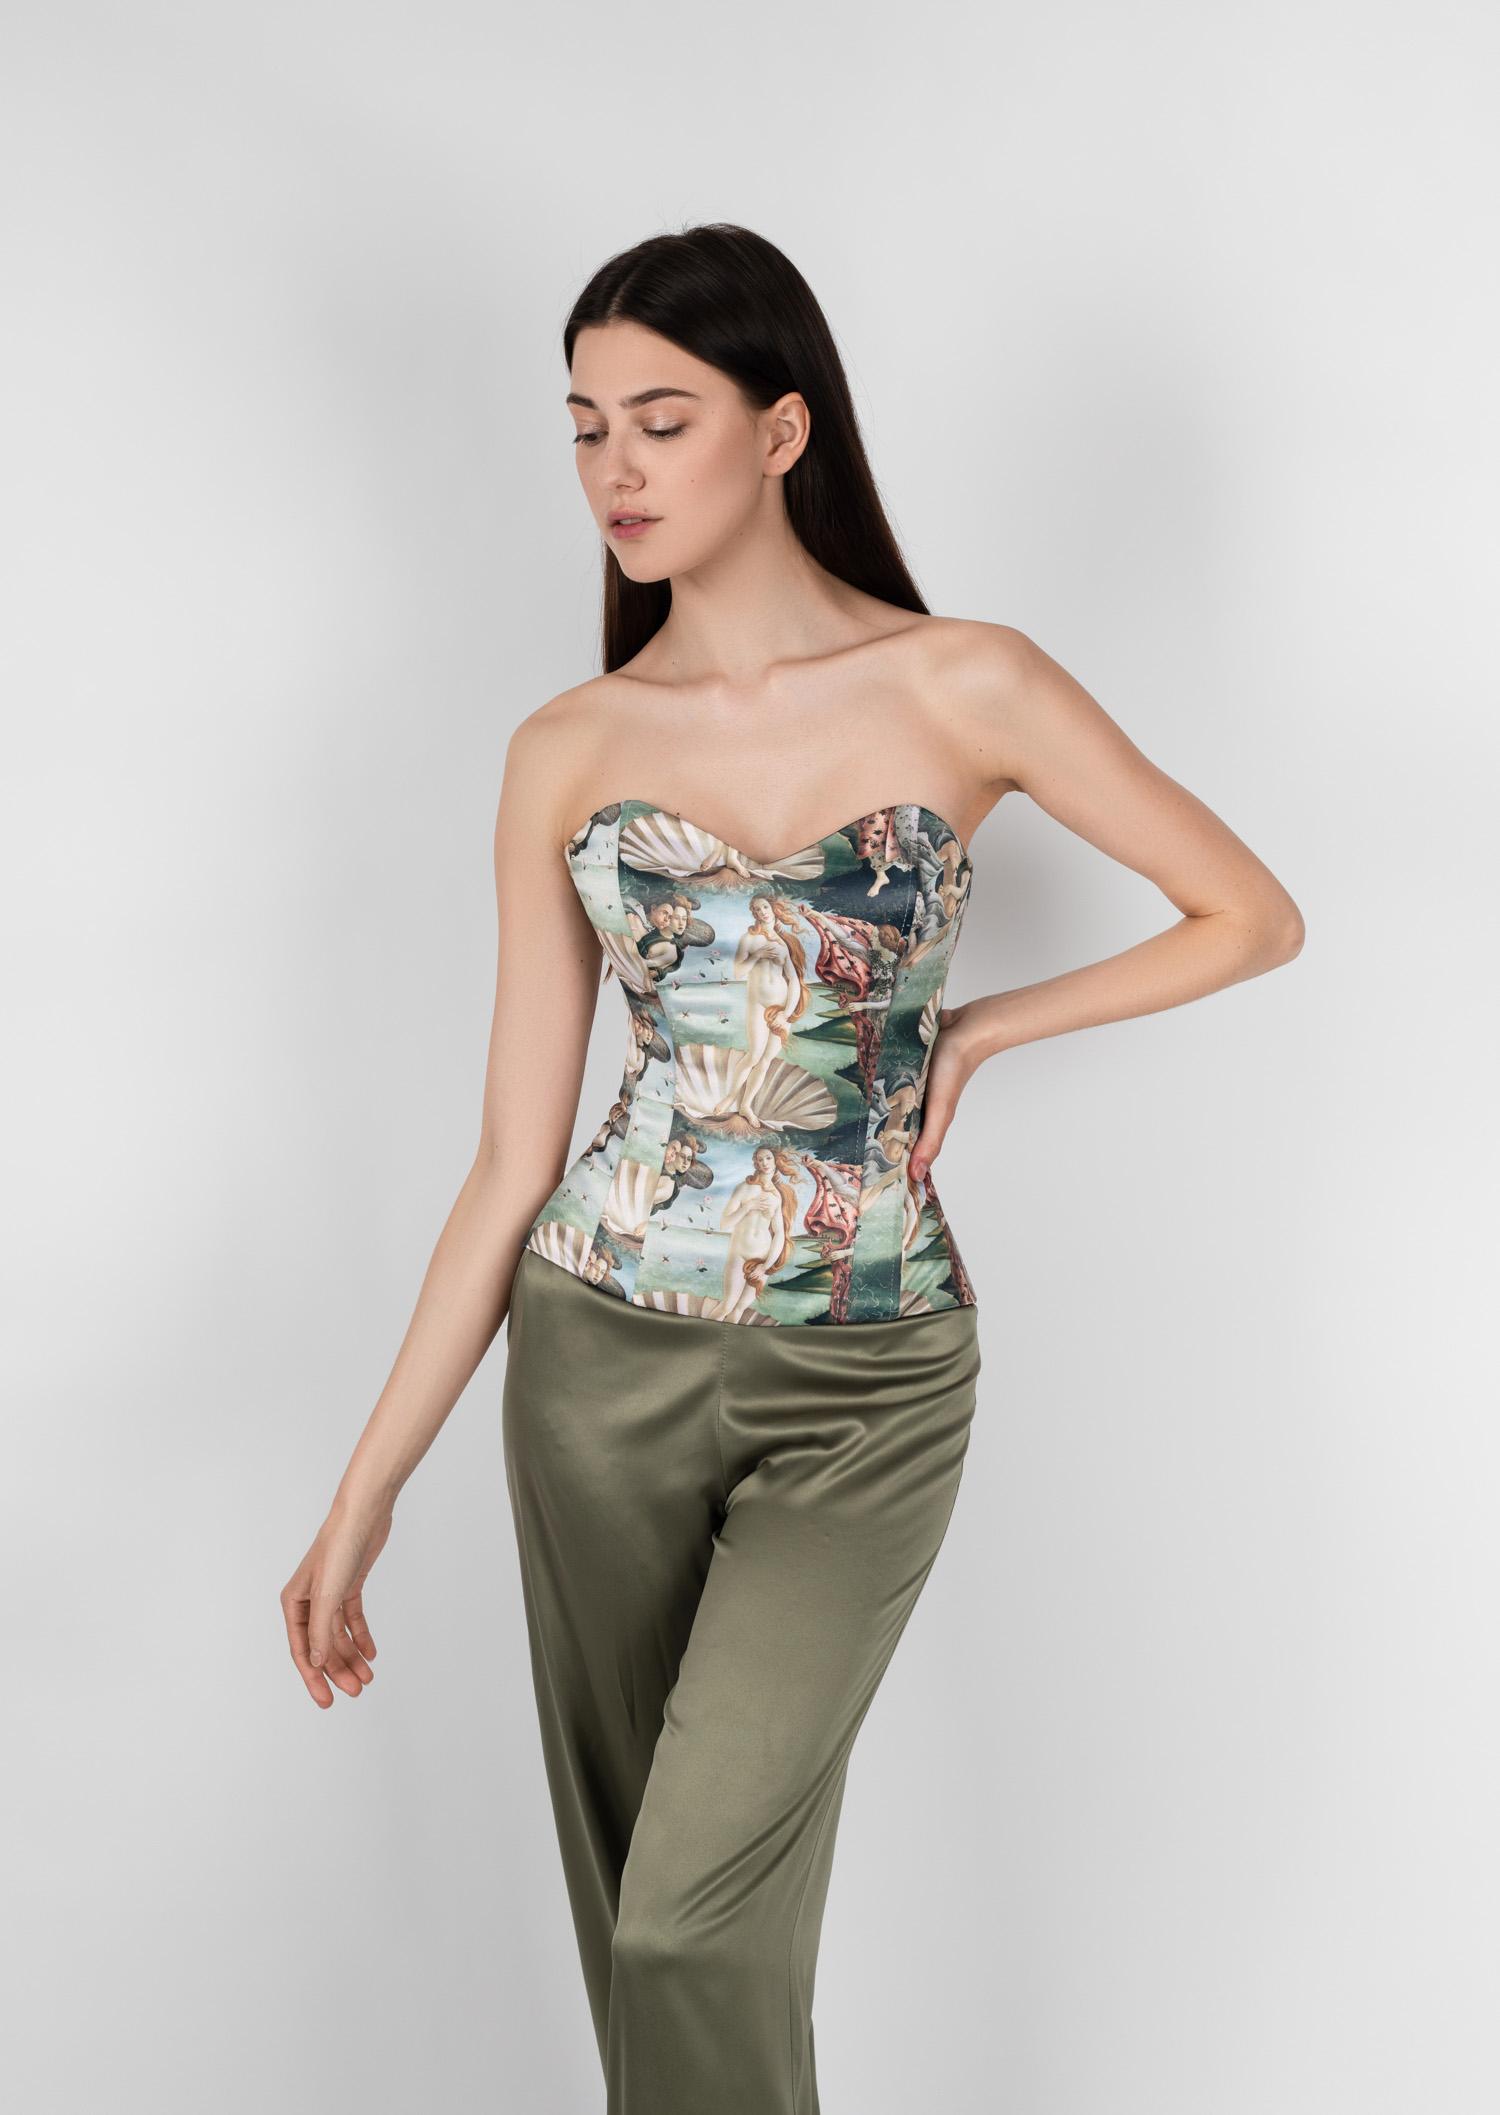 venus full corset historical vintage